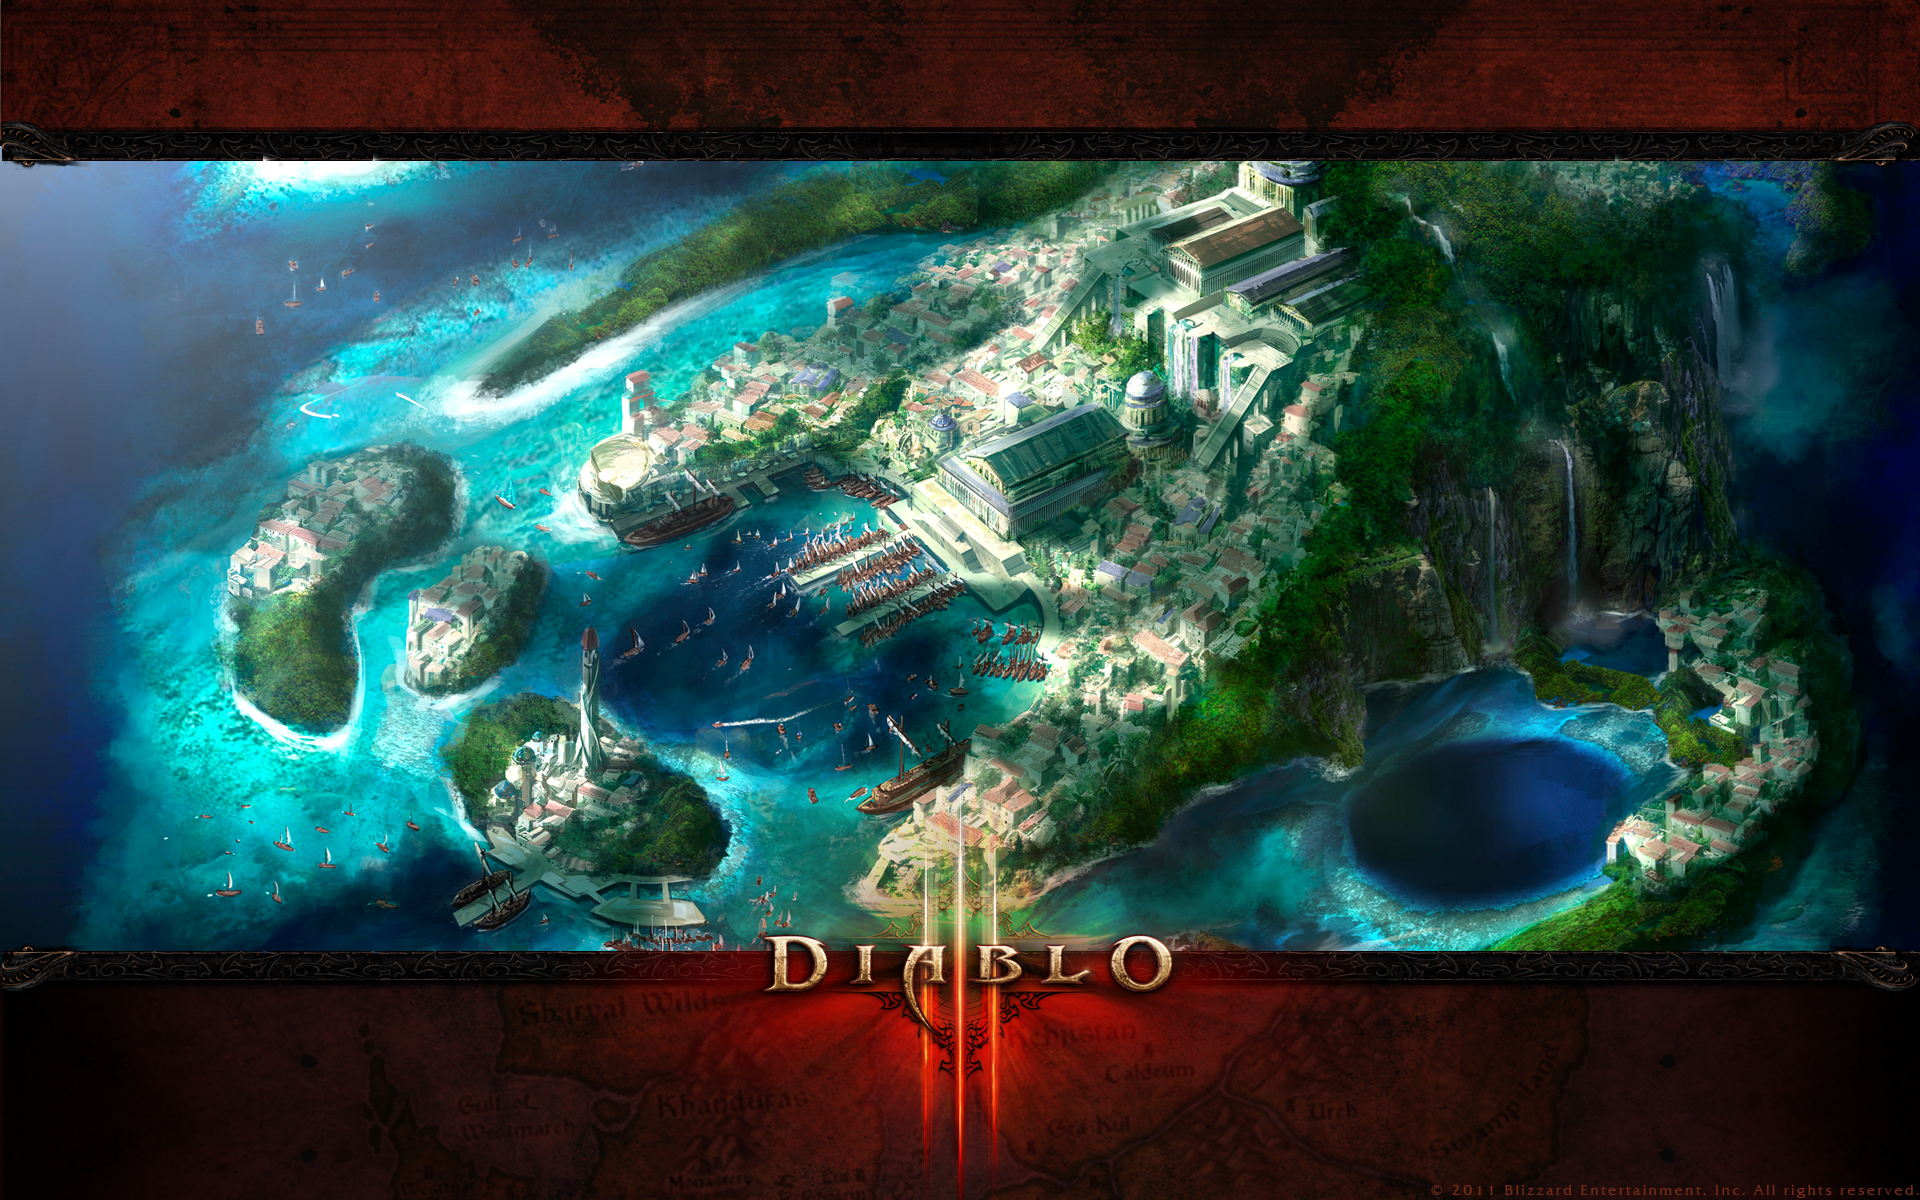 Diablo 3 wallpaper 8